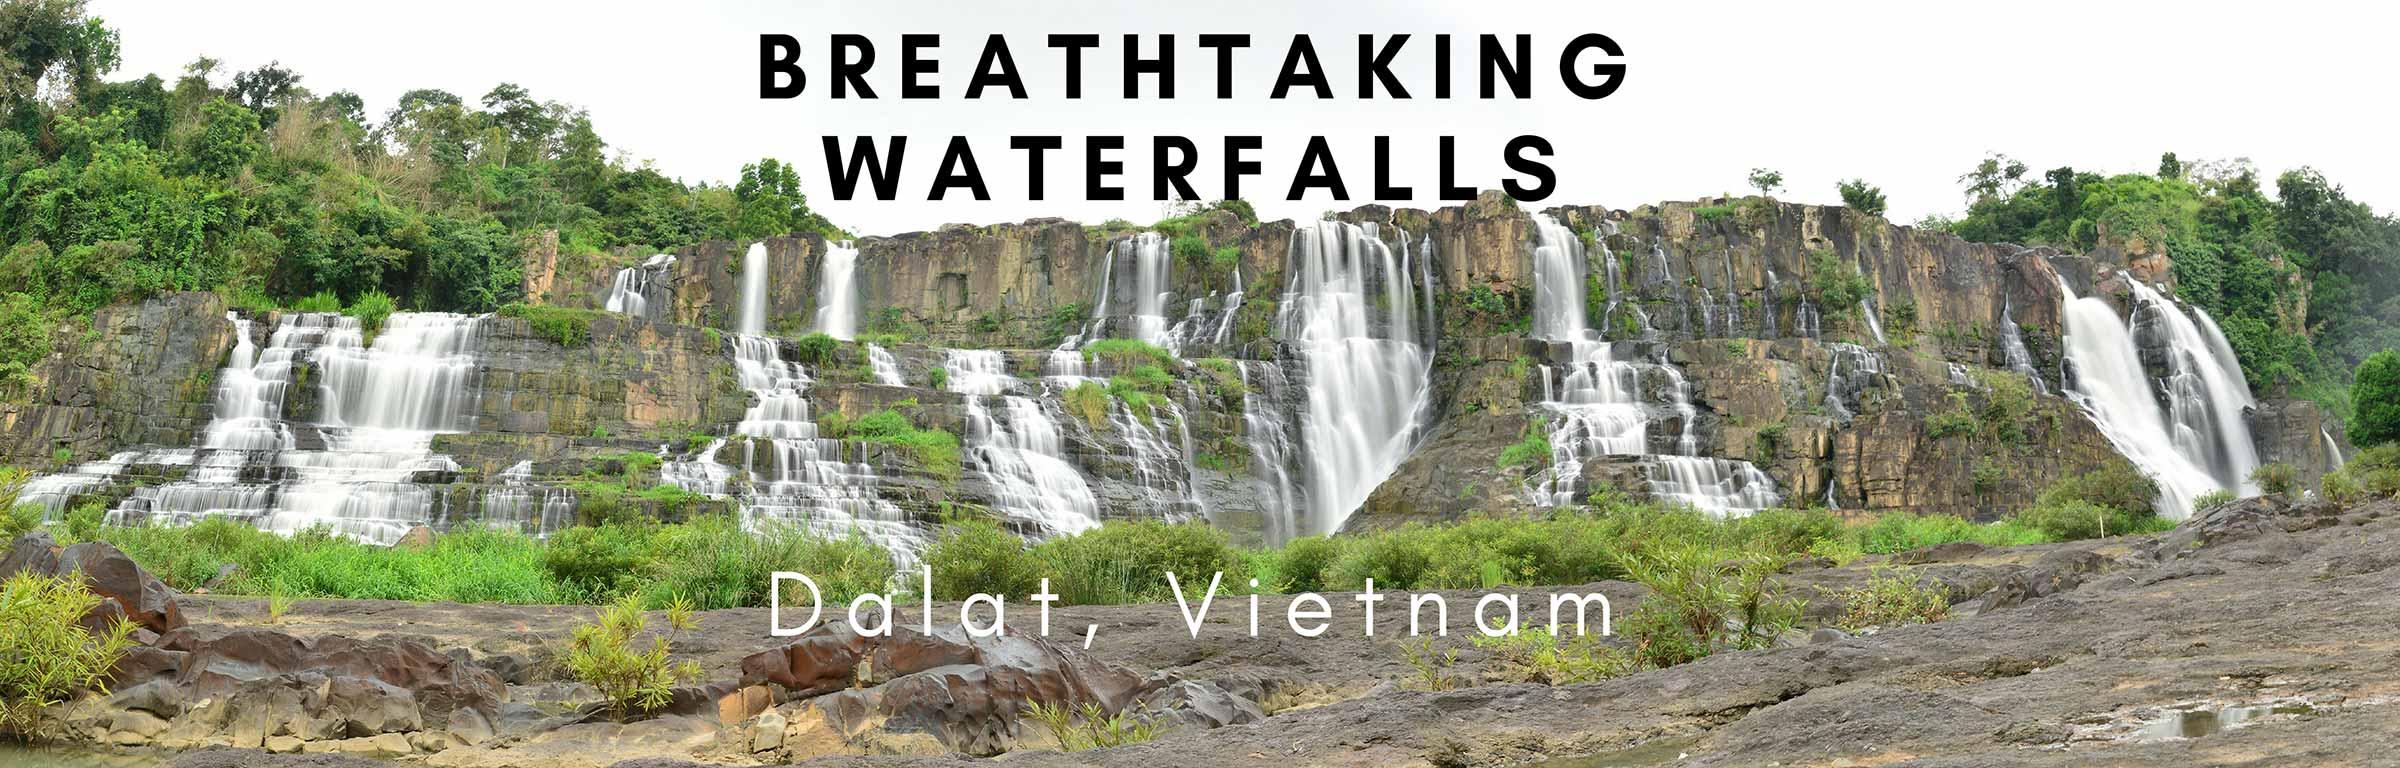 3 Must-See Waterfalls in Dalat, Vietnam - Live, Travel, Teach